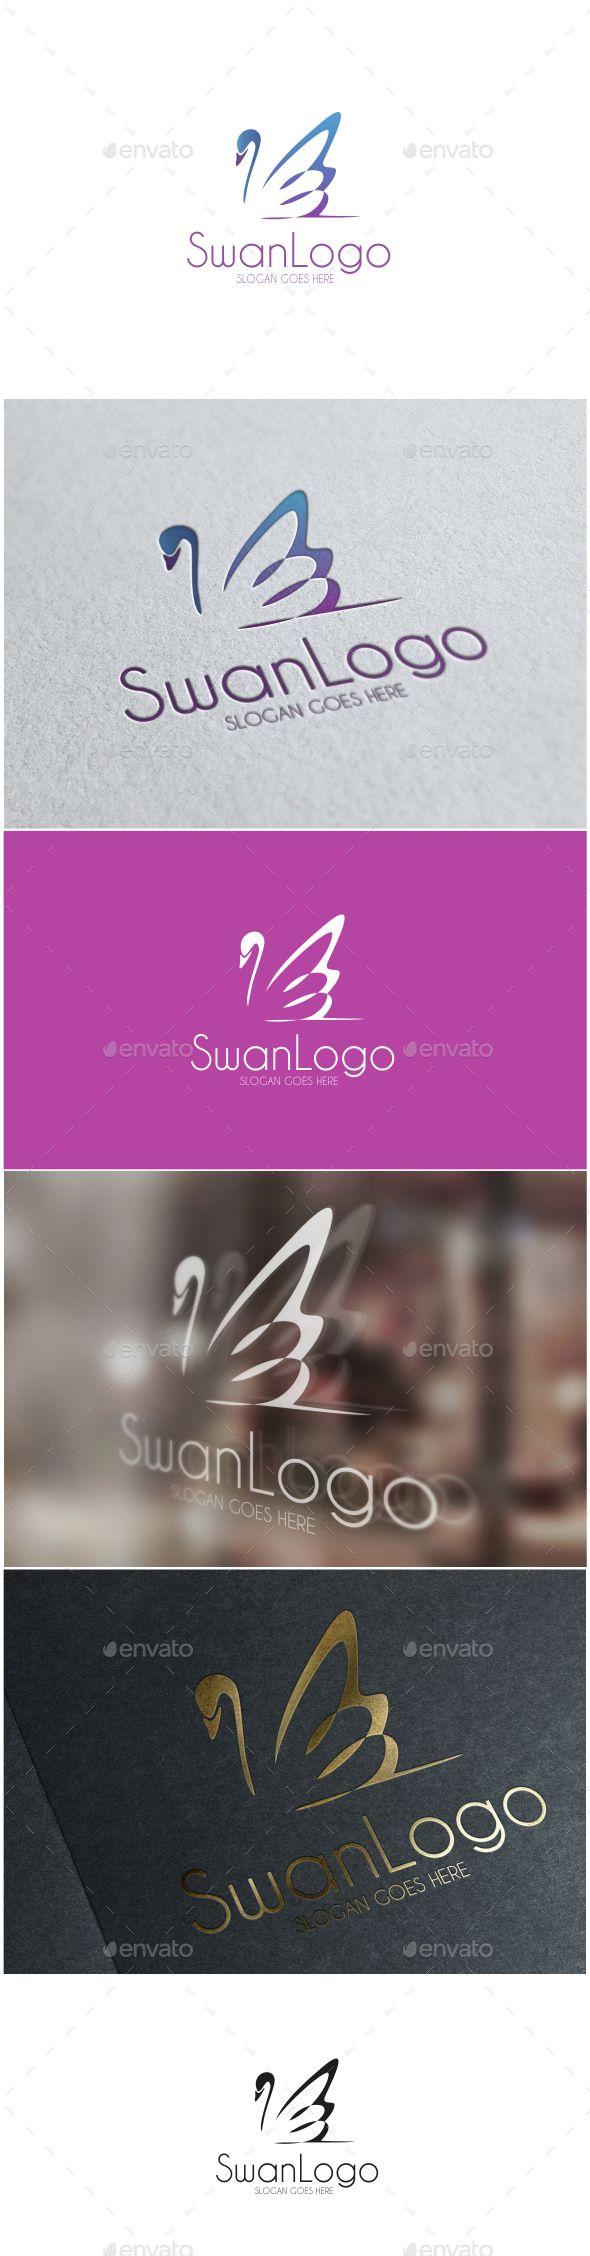 Swan  Logo Design Template Vector #logotype Download it here: http://graphicriver.net/item/-swan-logo/14674376?s_rank=1703?ref=nexion